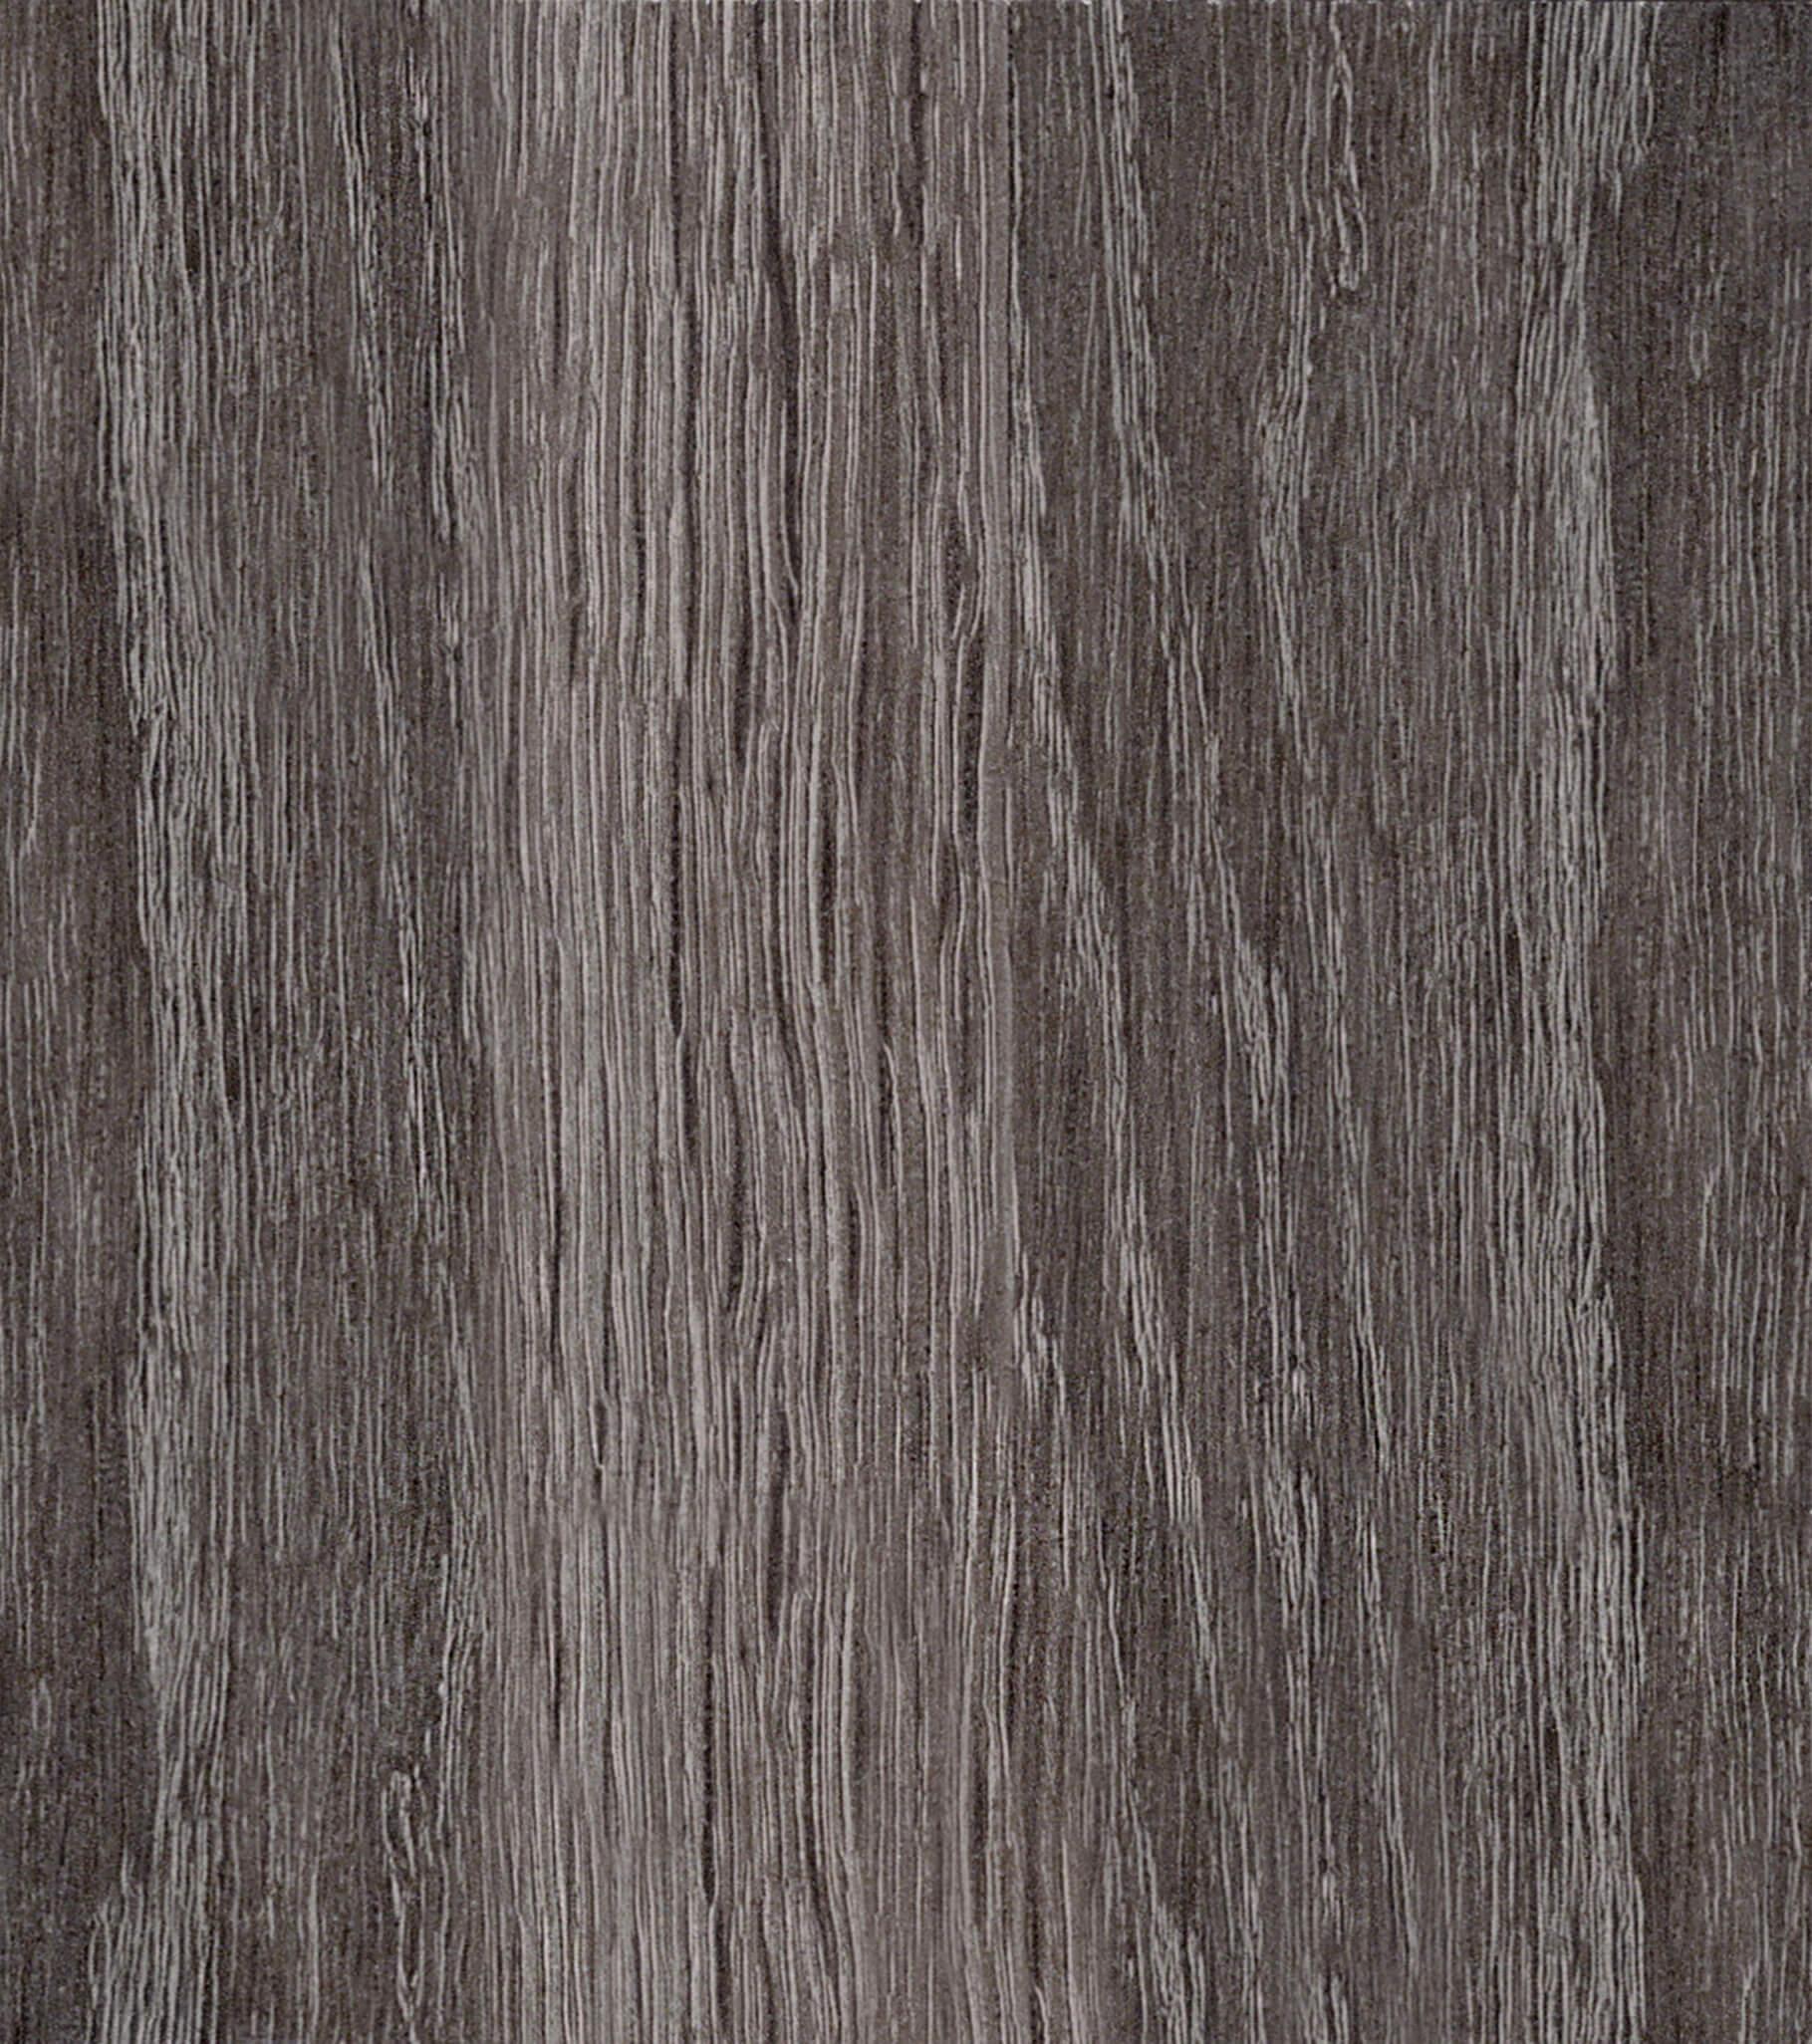 Cottage Oak Textured TFL